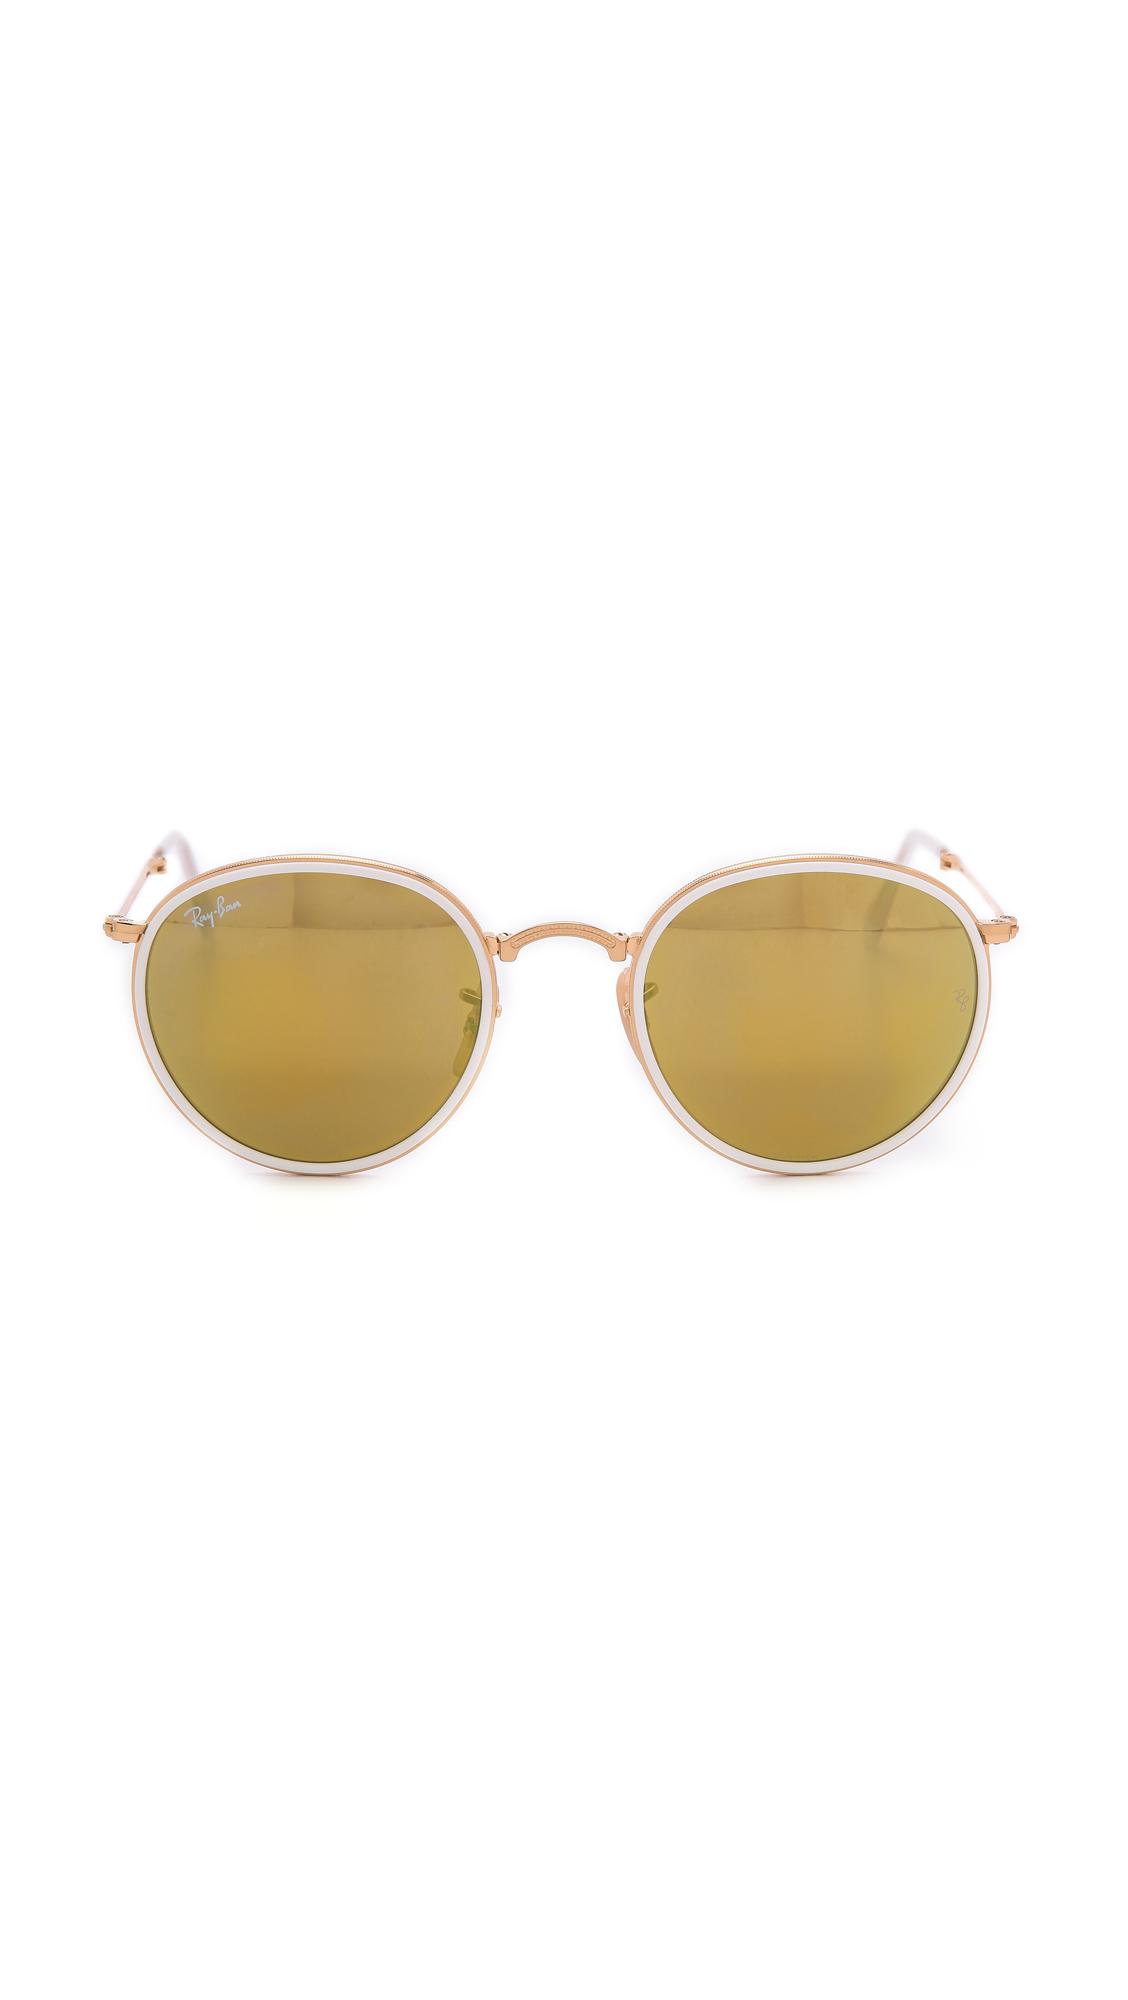 Ray ban sunglasses new design - Ray Ban Sunglasses New Design 55